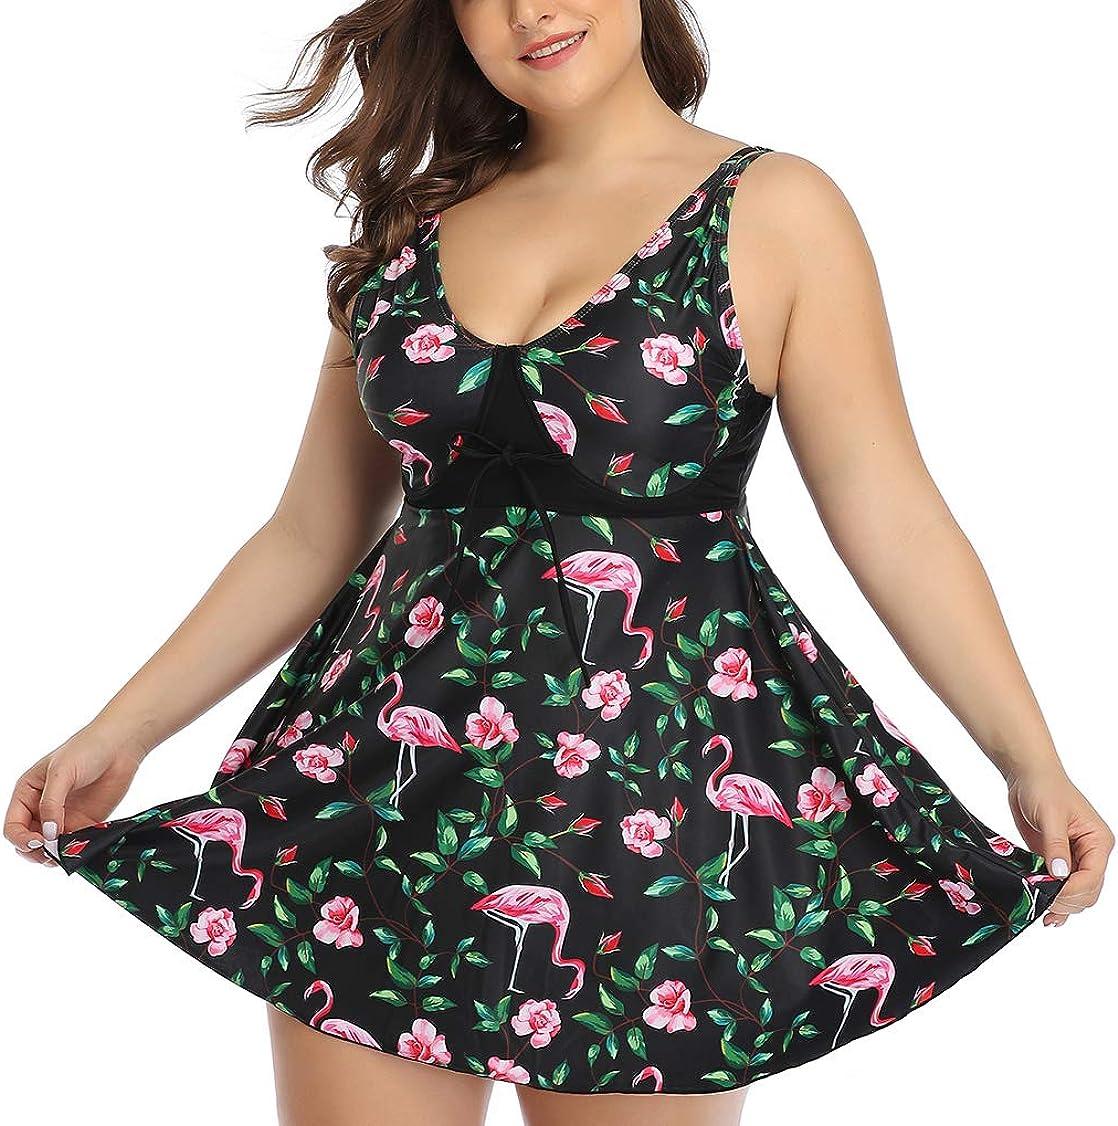 Lovacely Women Plus Size Two Piece Floral Swimwear Tankini Bathing Suit Flowy Skirted Swimsuits